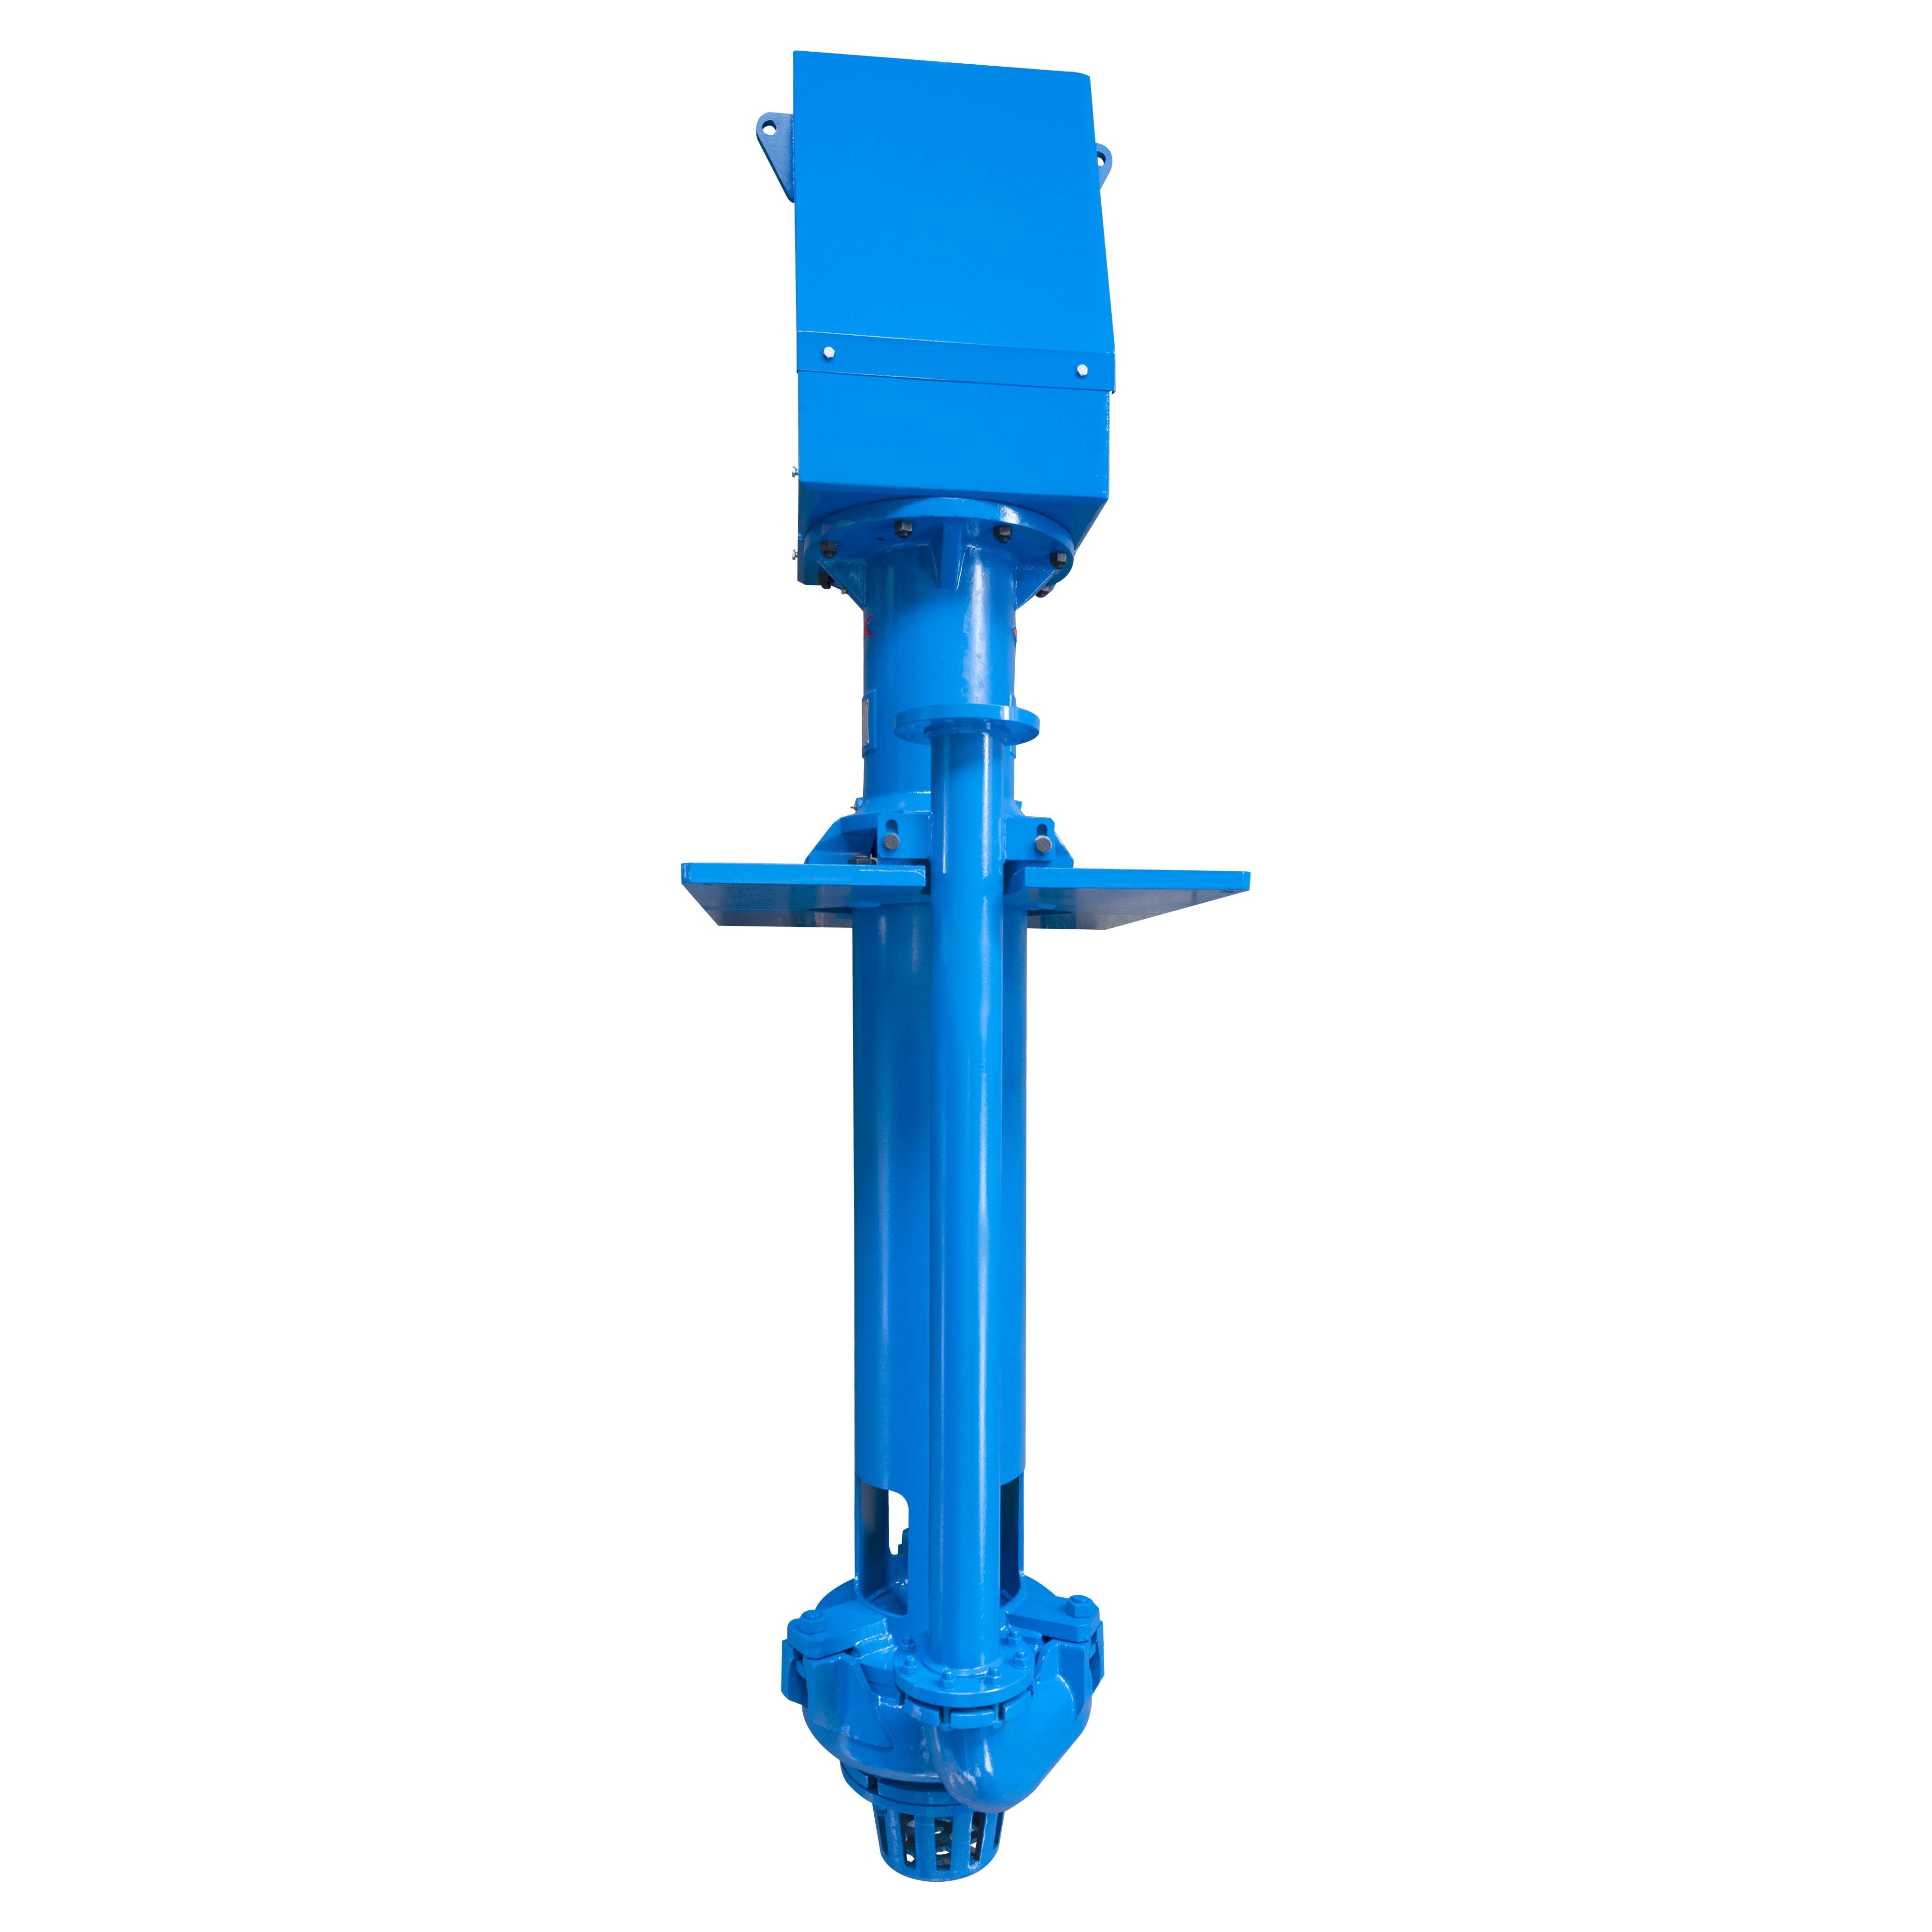 Slime sump pumps centrifugal mining vertical slurry pump different with parker hydraulic pump,vacuum pump